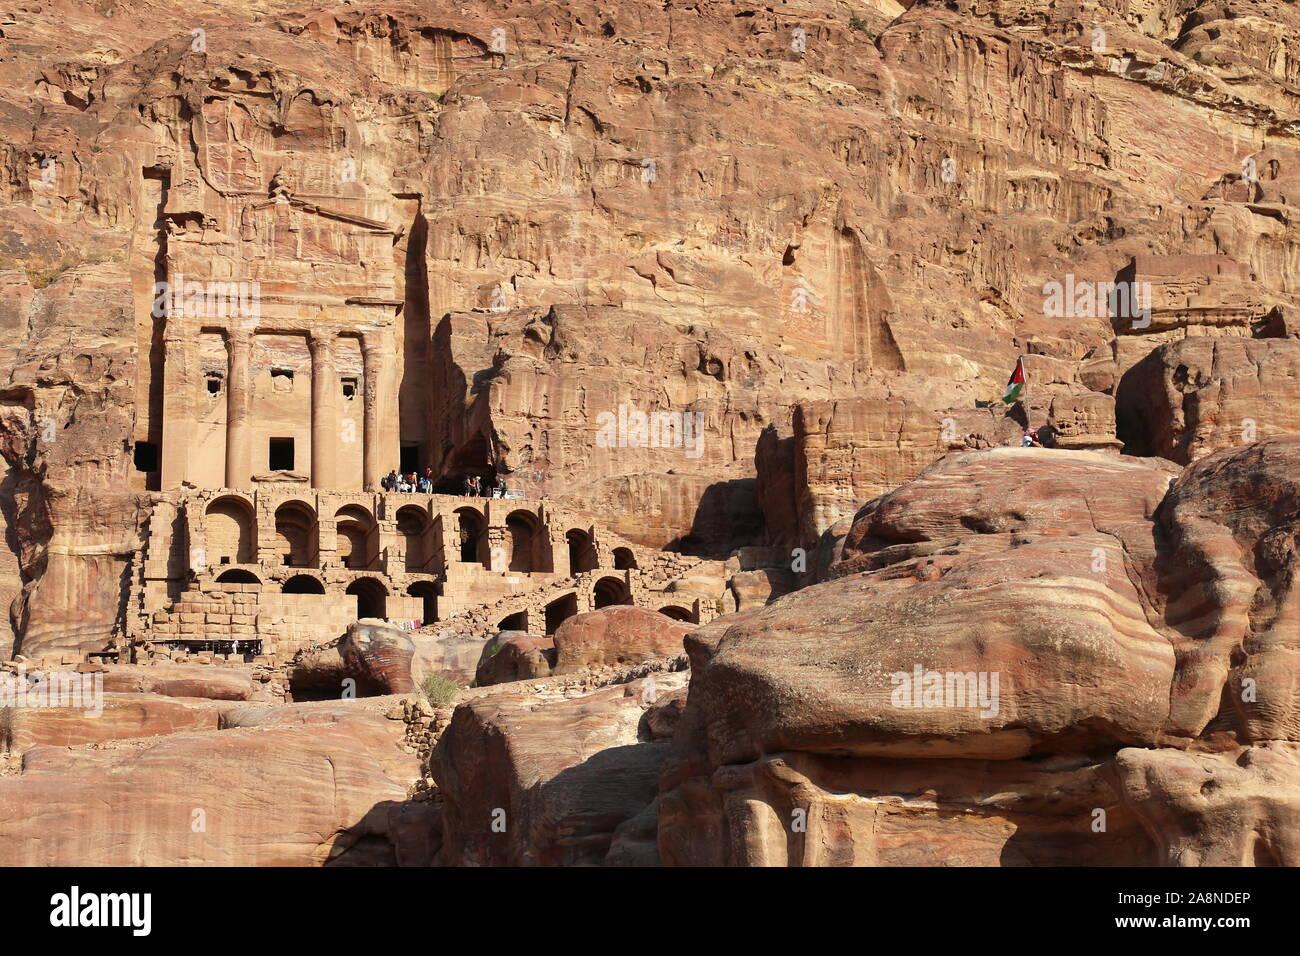 Urn Tomb (Qabr Al Jarrah), Royal Tombs, Treasury Viewpoint Trail, Petra, Wadi Musa, Ma'an Governorate, Jordan, Middle East Stock Photo